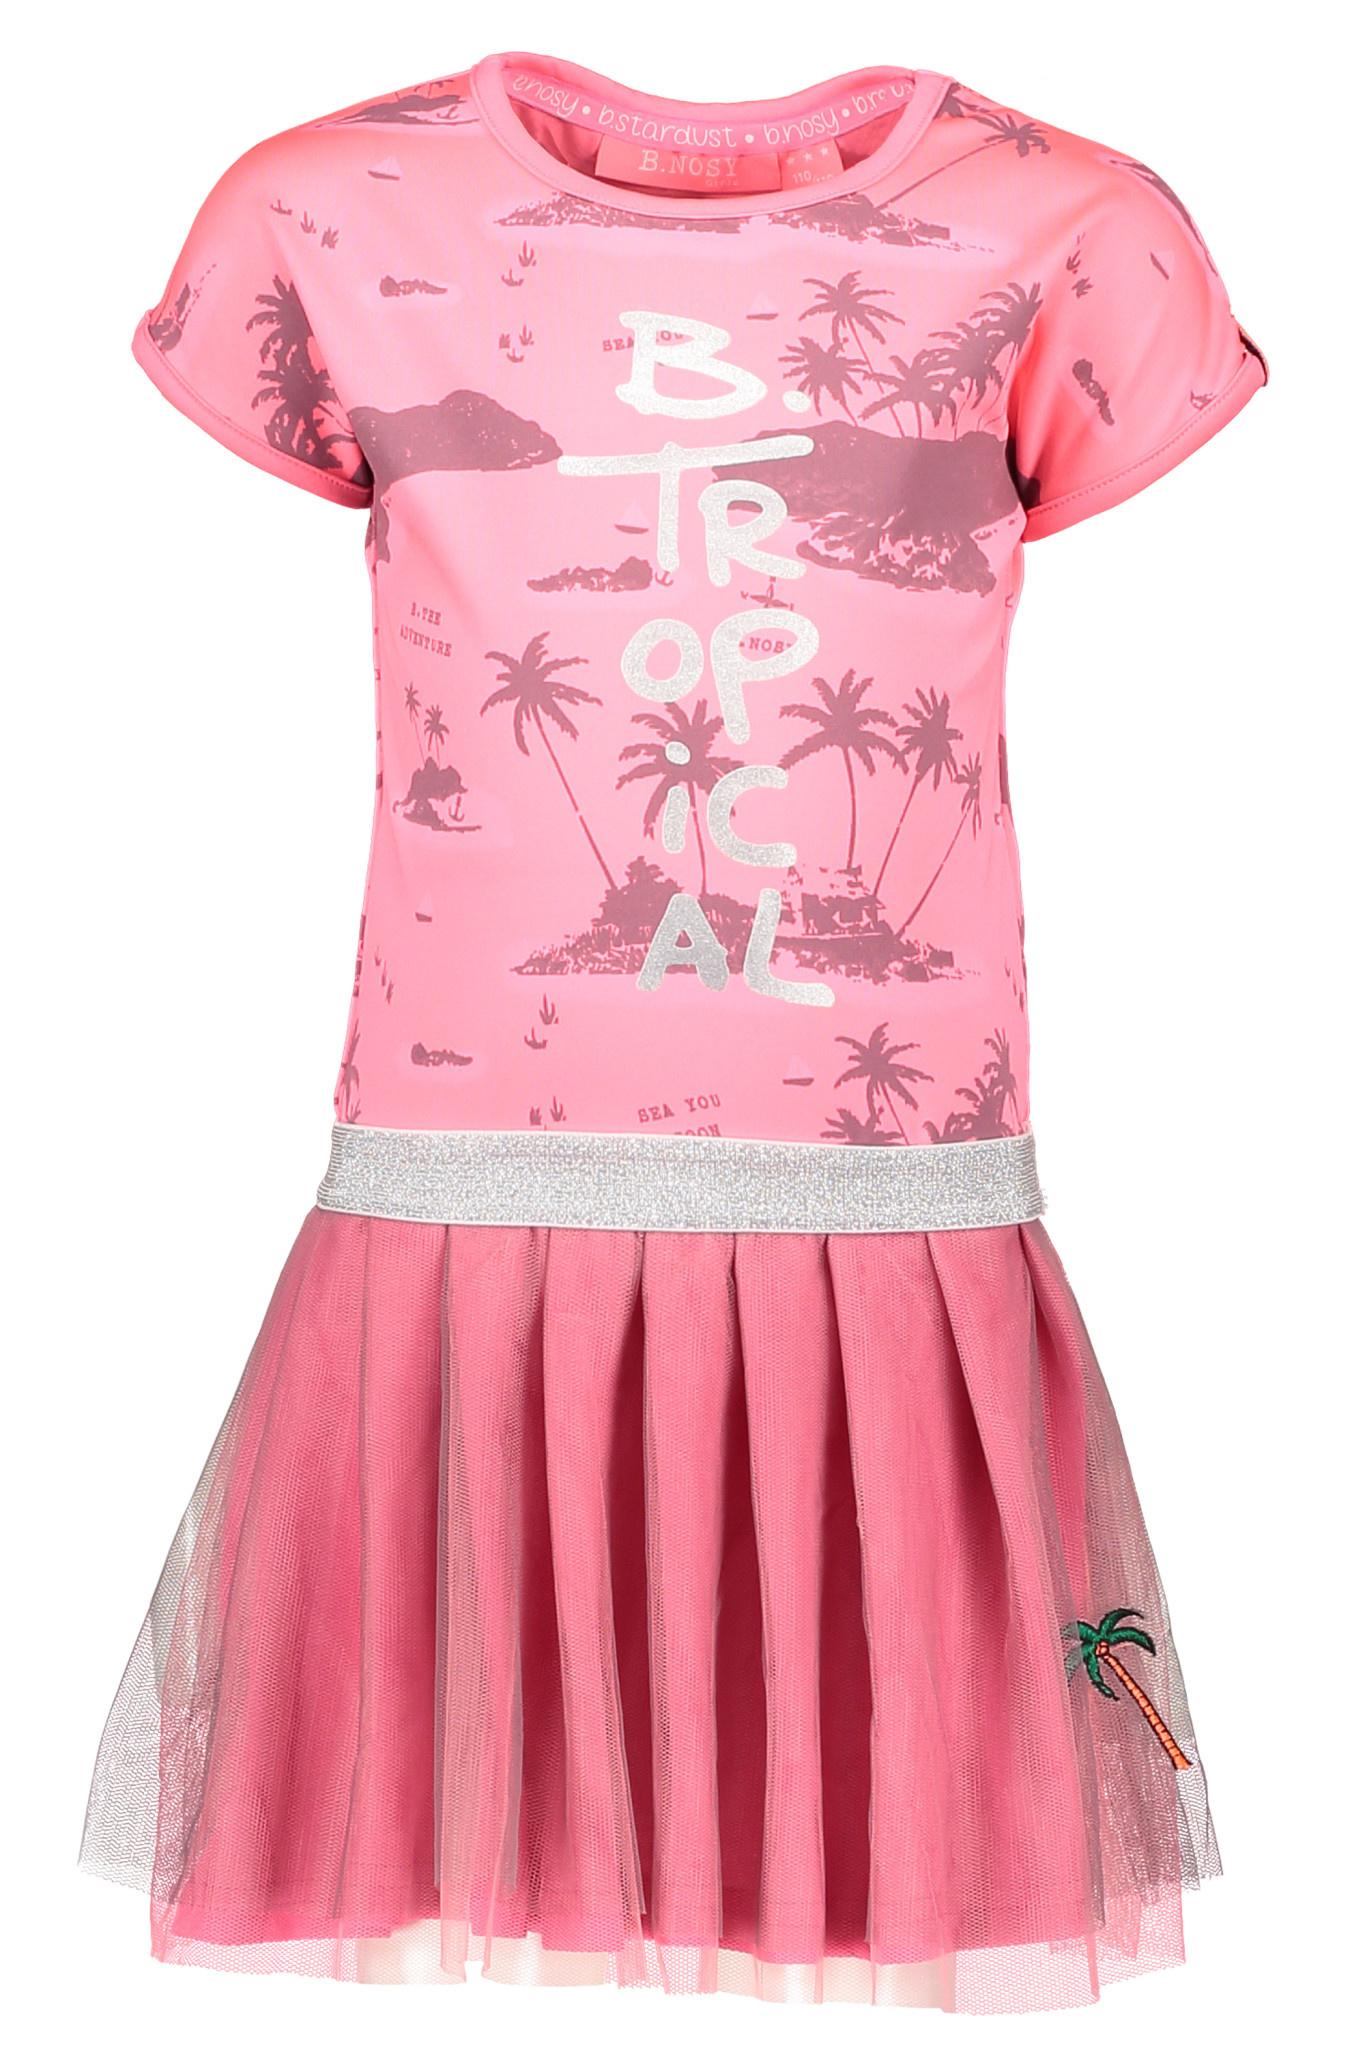 B.Nosy B.Nosy jurk jersey aloha with double layer netting ao bubblegum